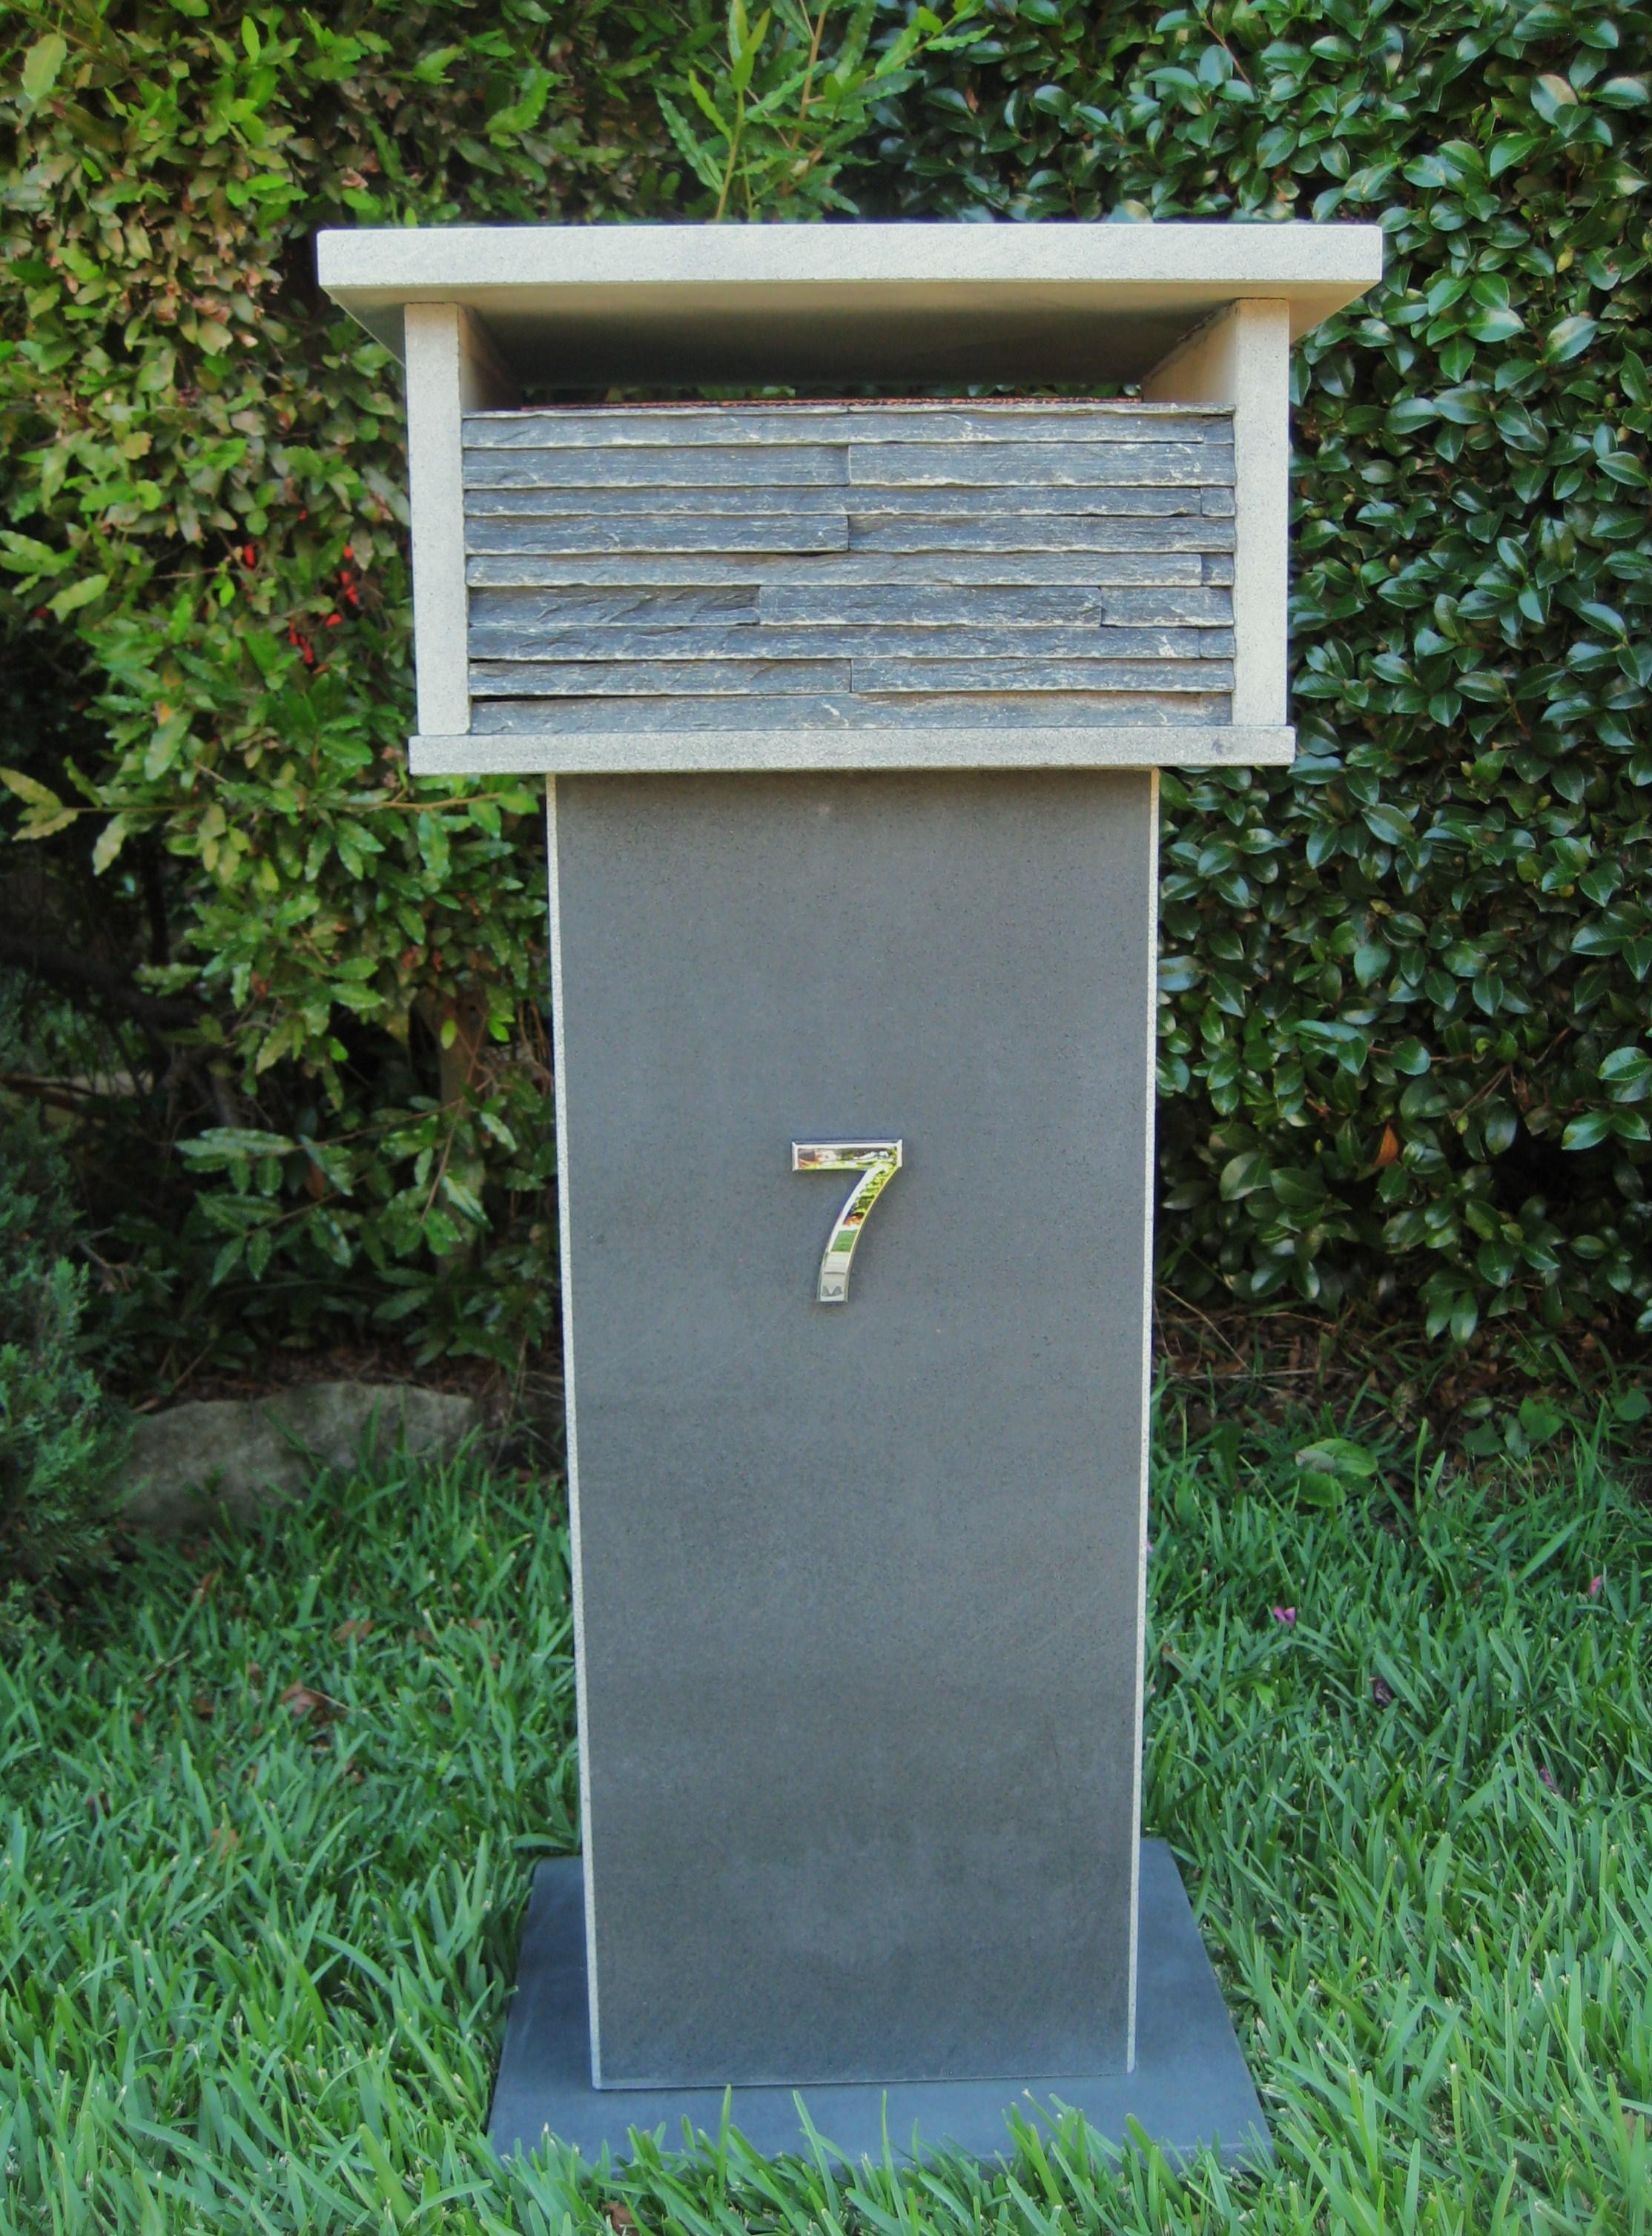 4. Bluestone Letterbox solid, aluminium back door with 2 key lock 860cm high top part mesure 300mm x 400mm. $600